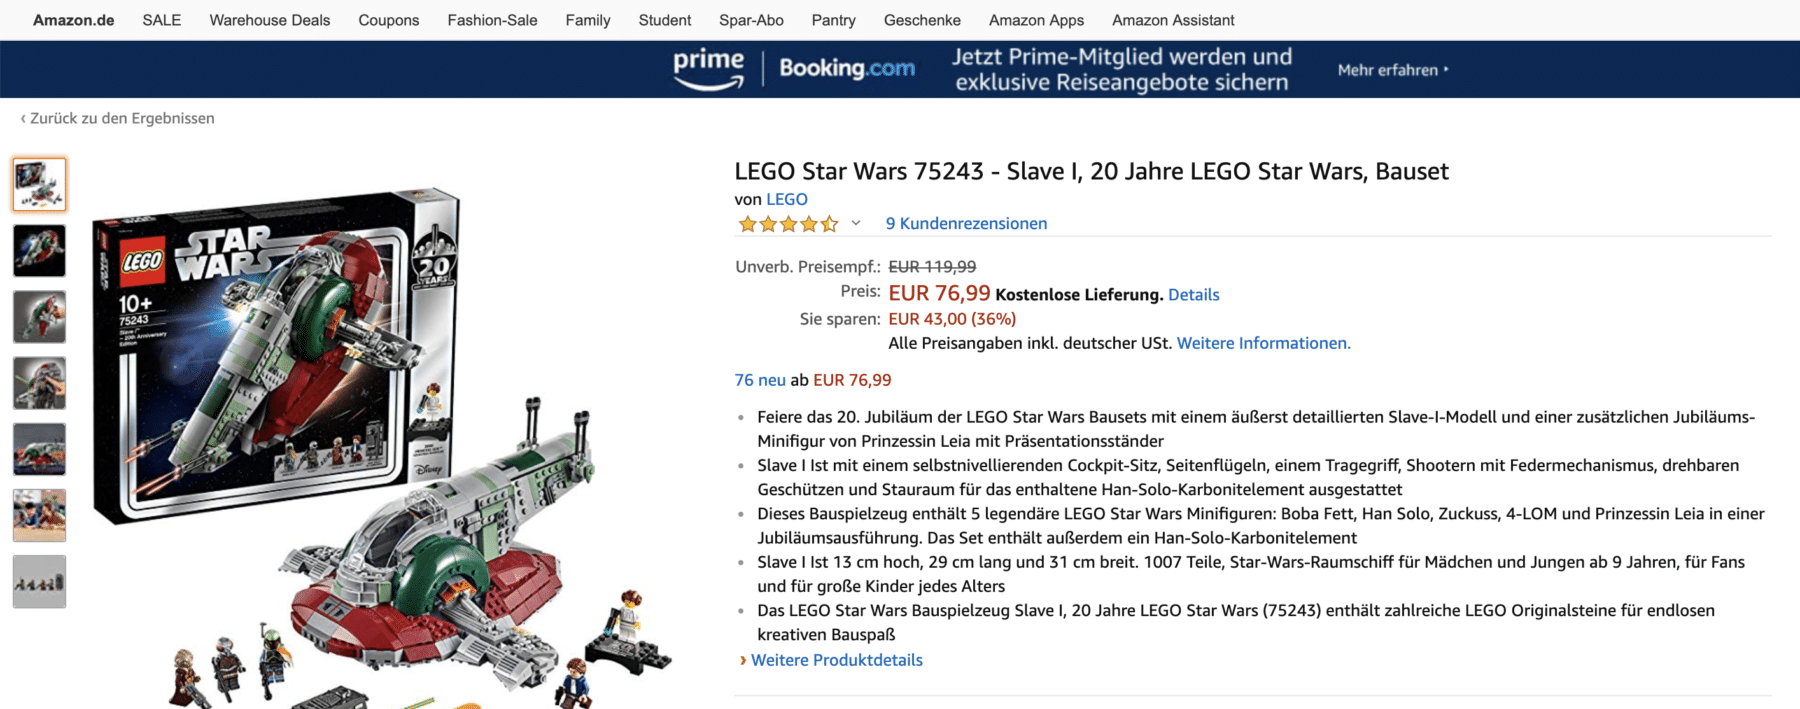 LEGO 75243 Slave 1 Angebot